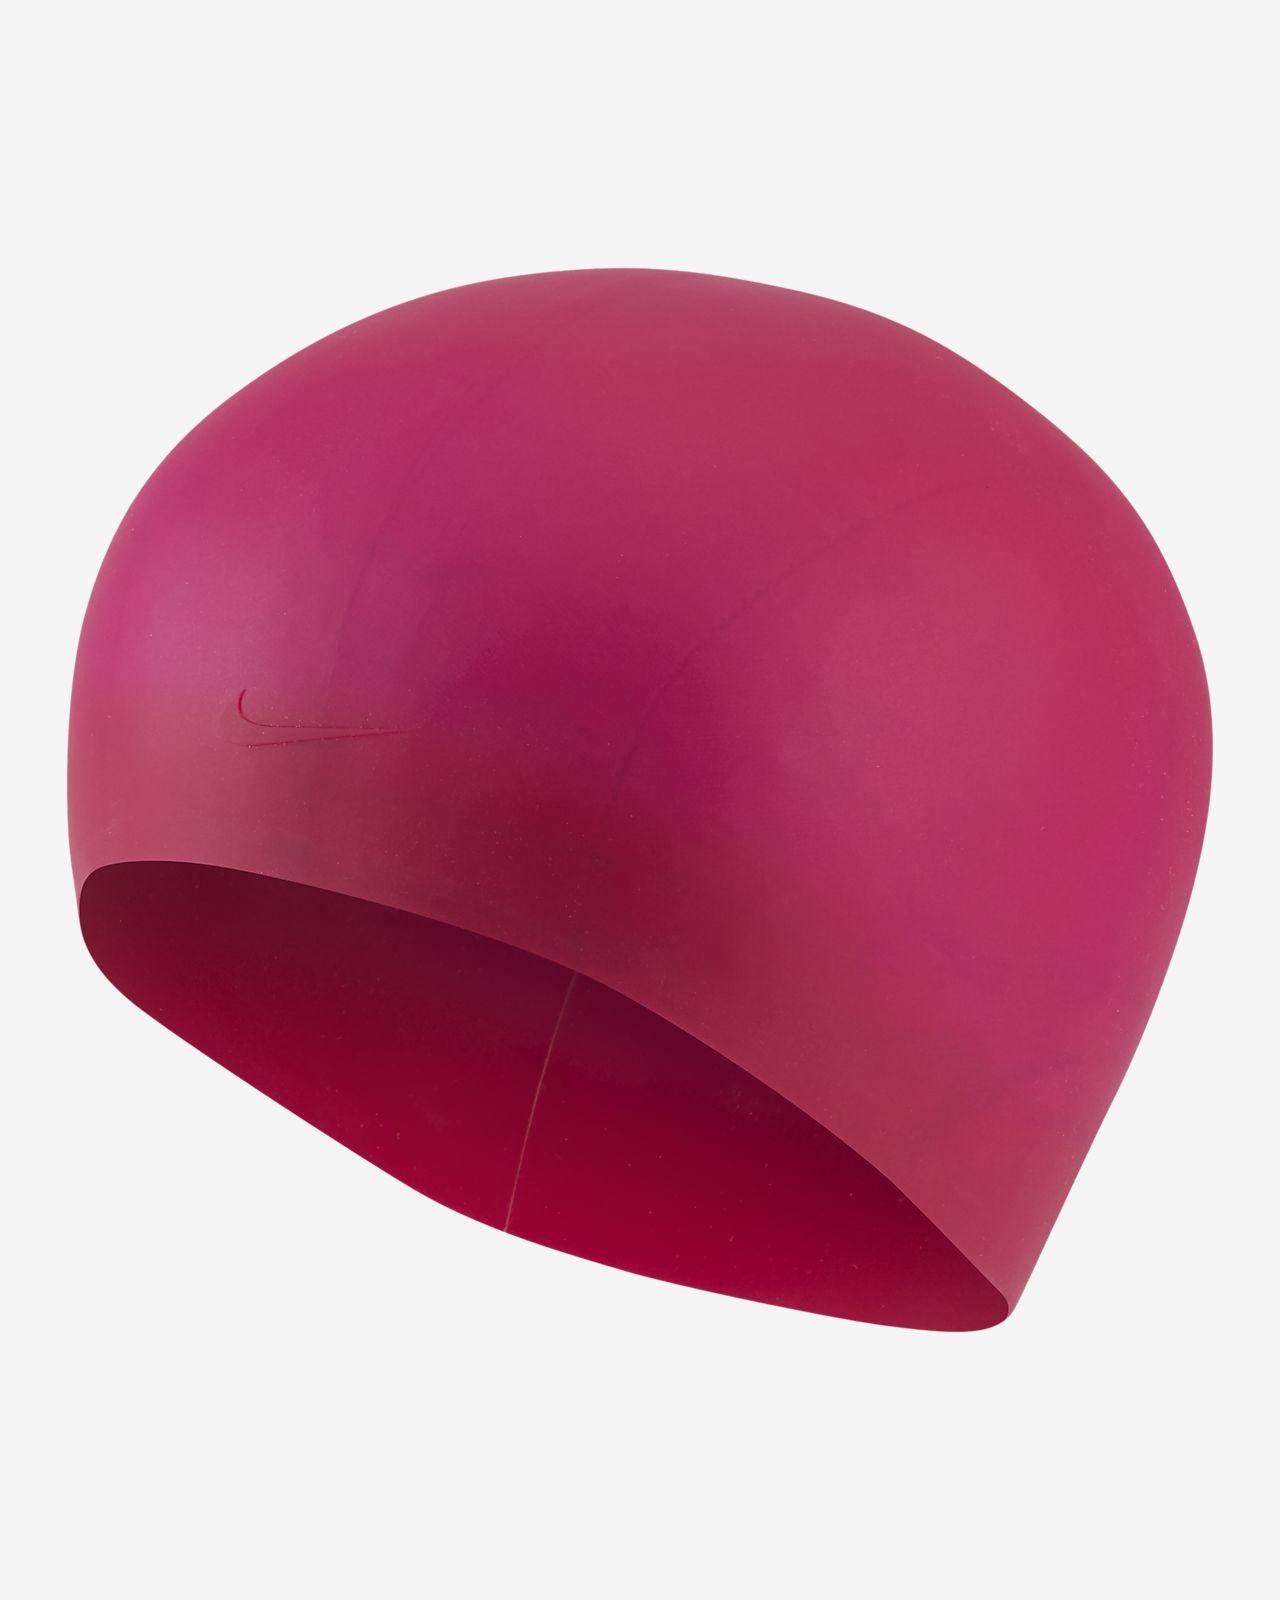 Nike Long Hair Silicone Swim Cap